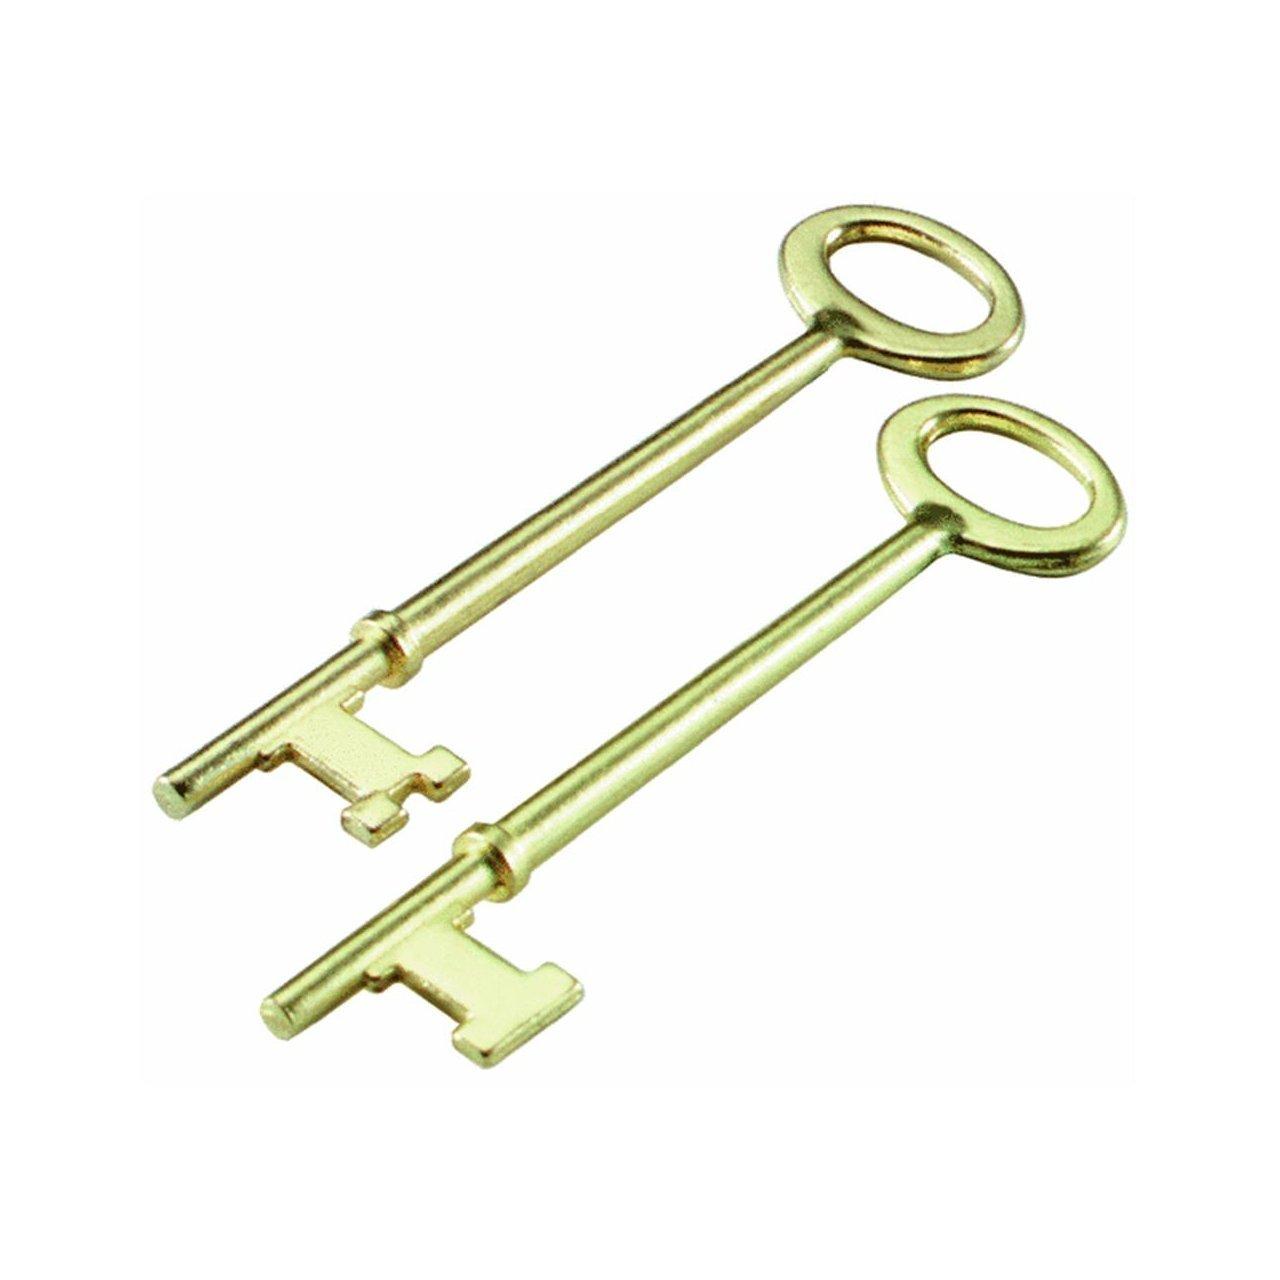 Lucky Line 87202 Skeleton Keys Amazon.jpg